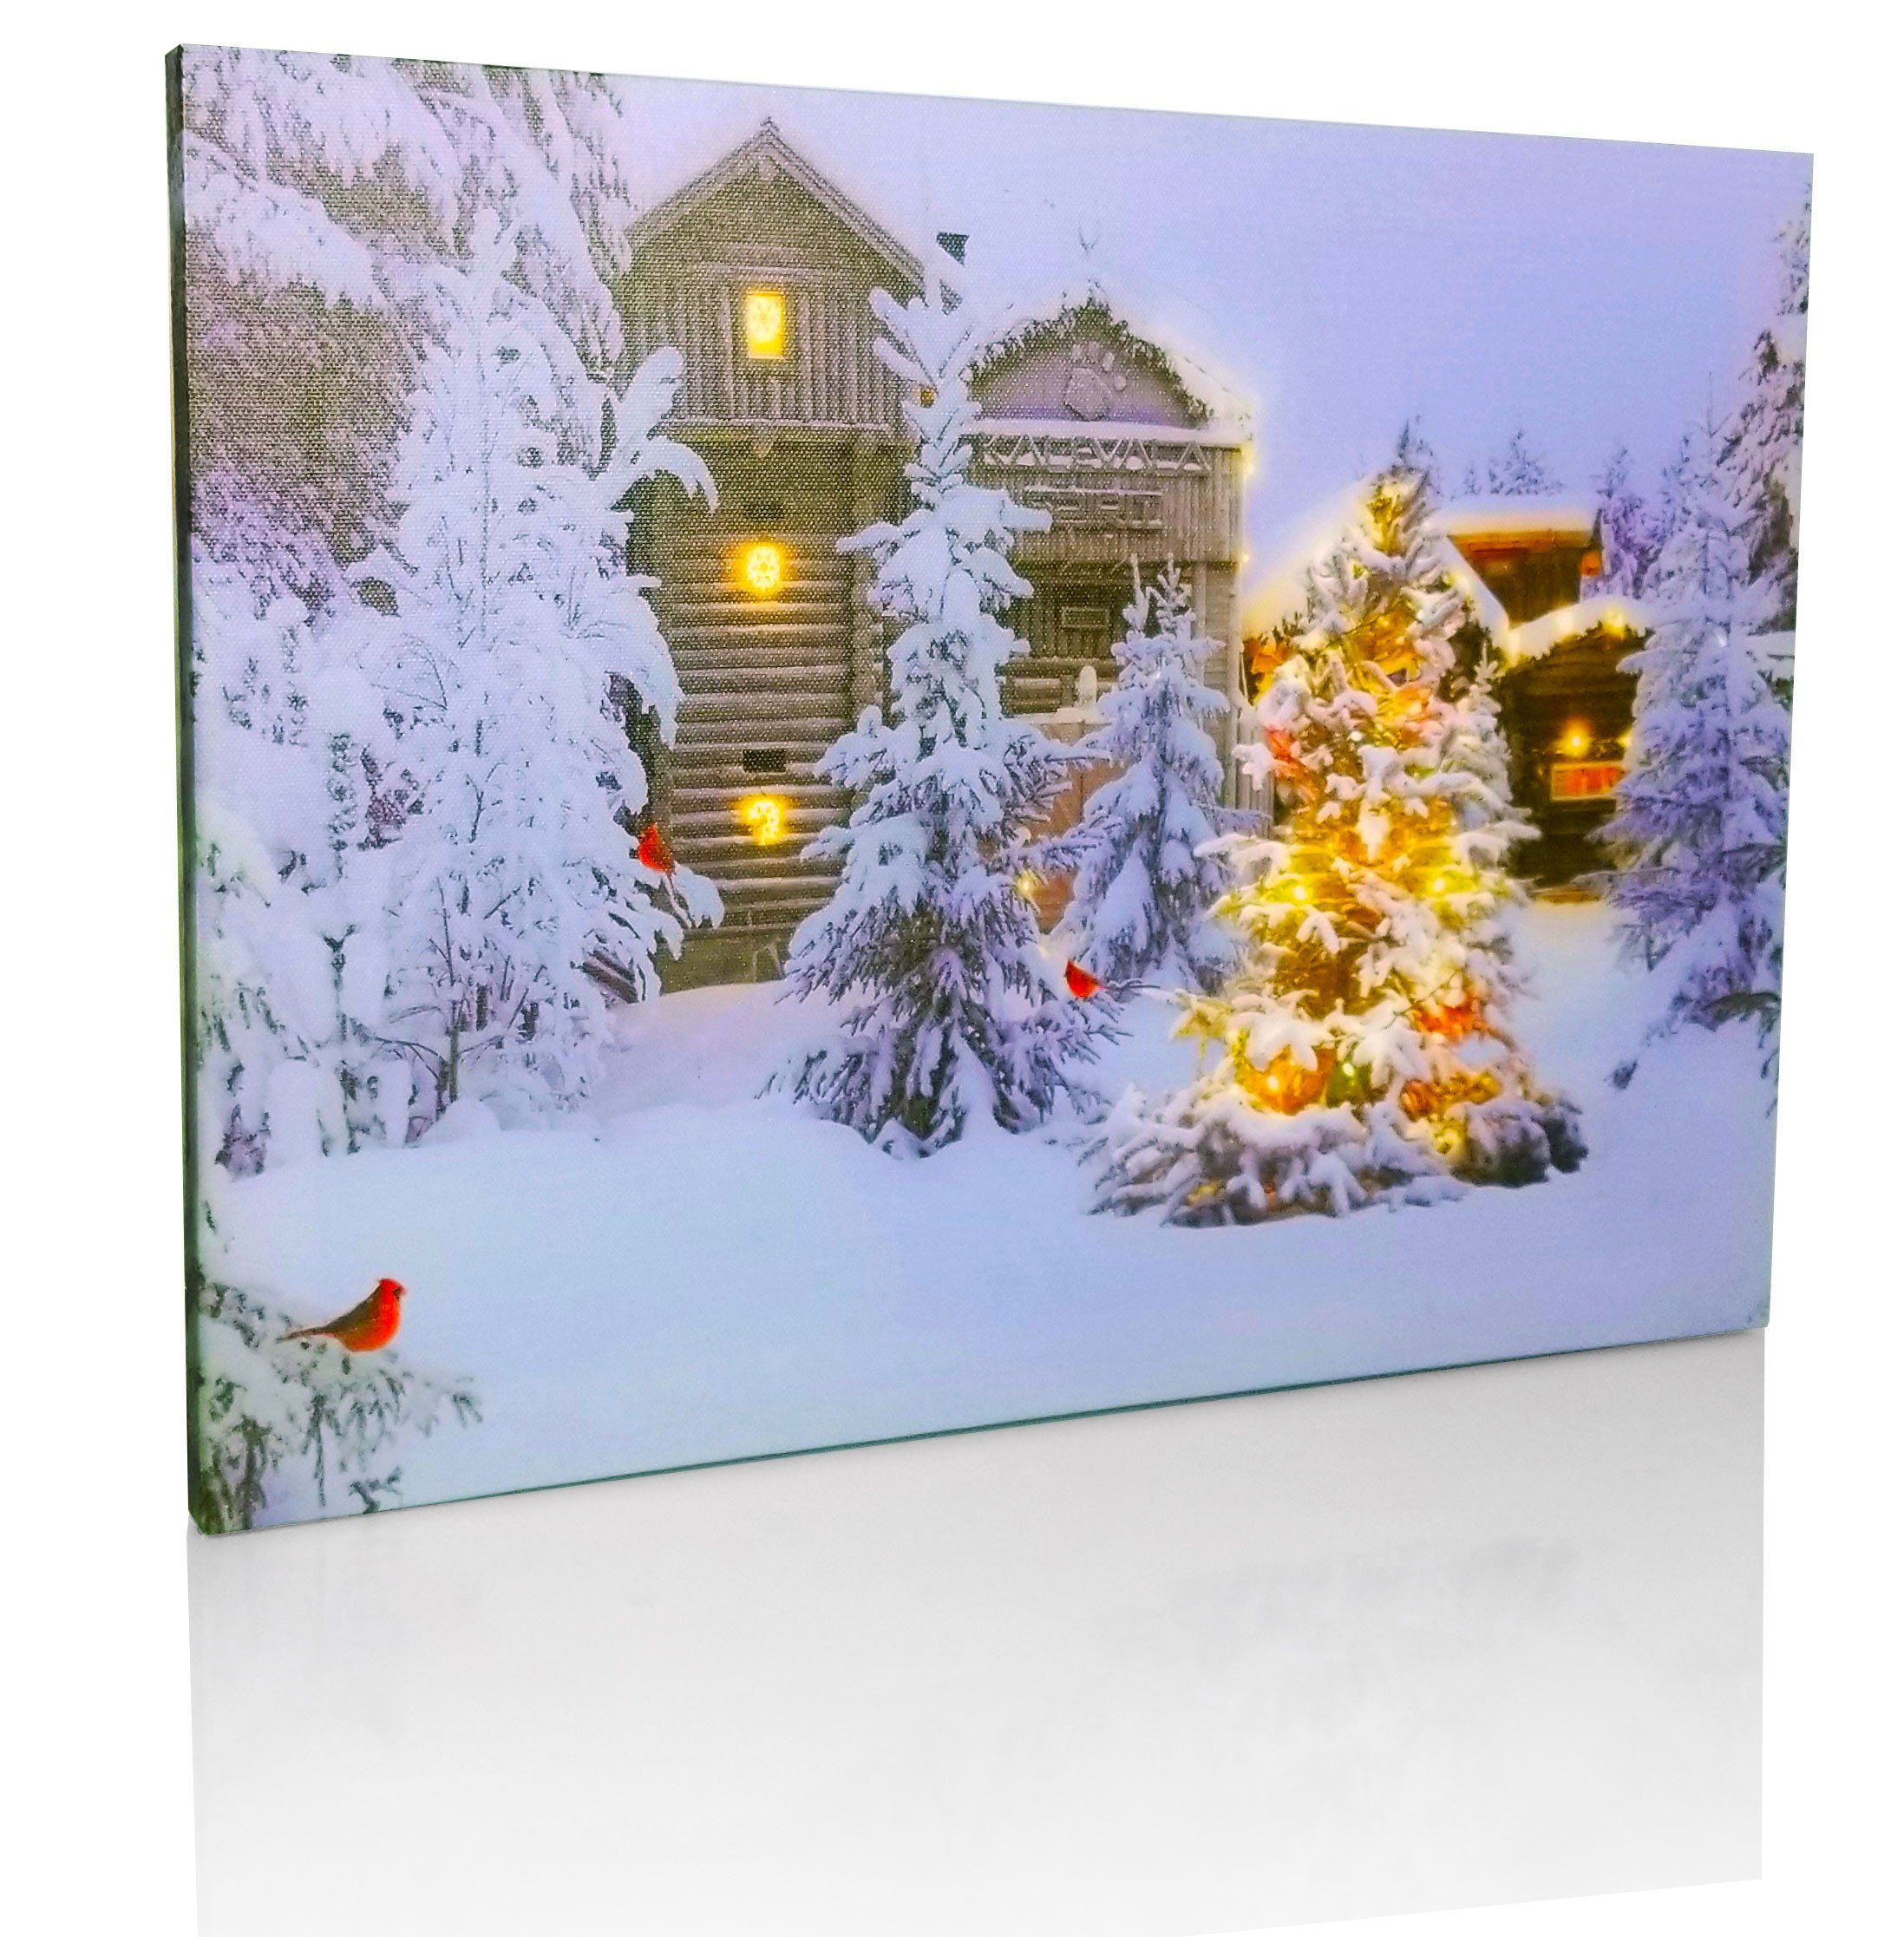 Fibre Optic LED Light Up Christmas Winter Scene Canvas Print Wall Art Hanging